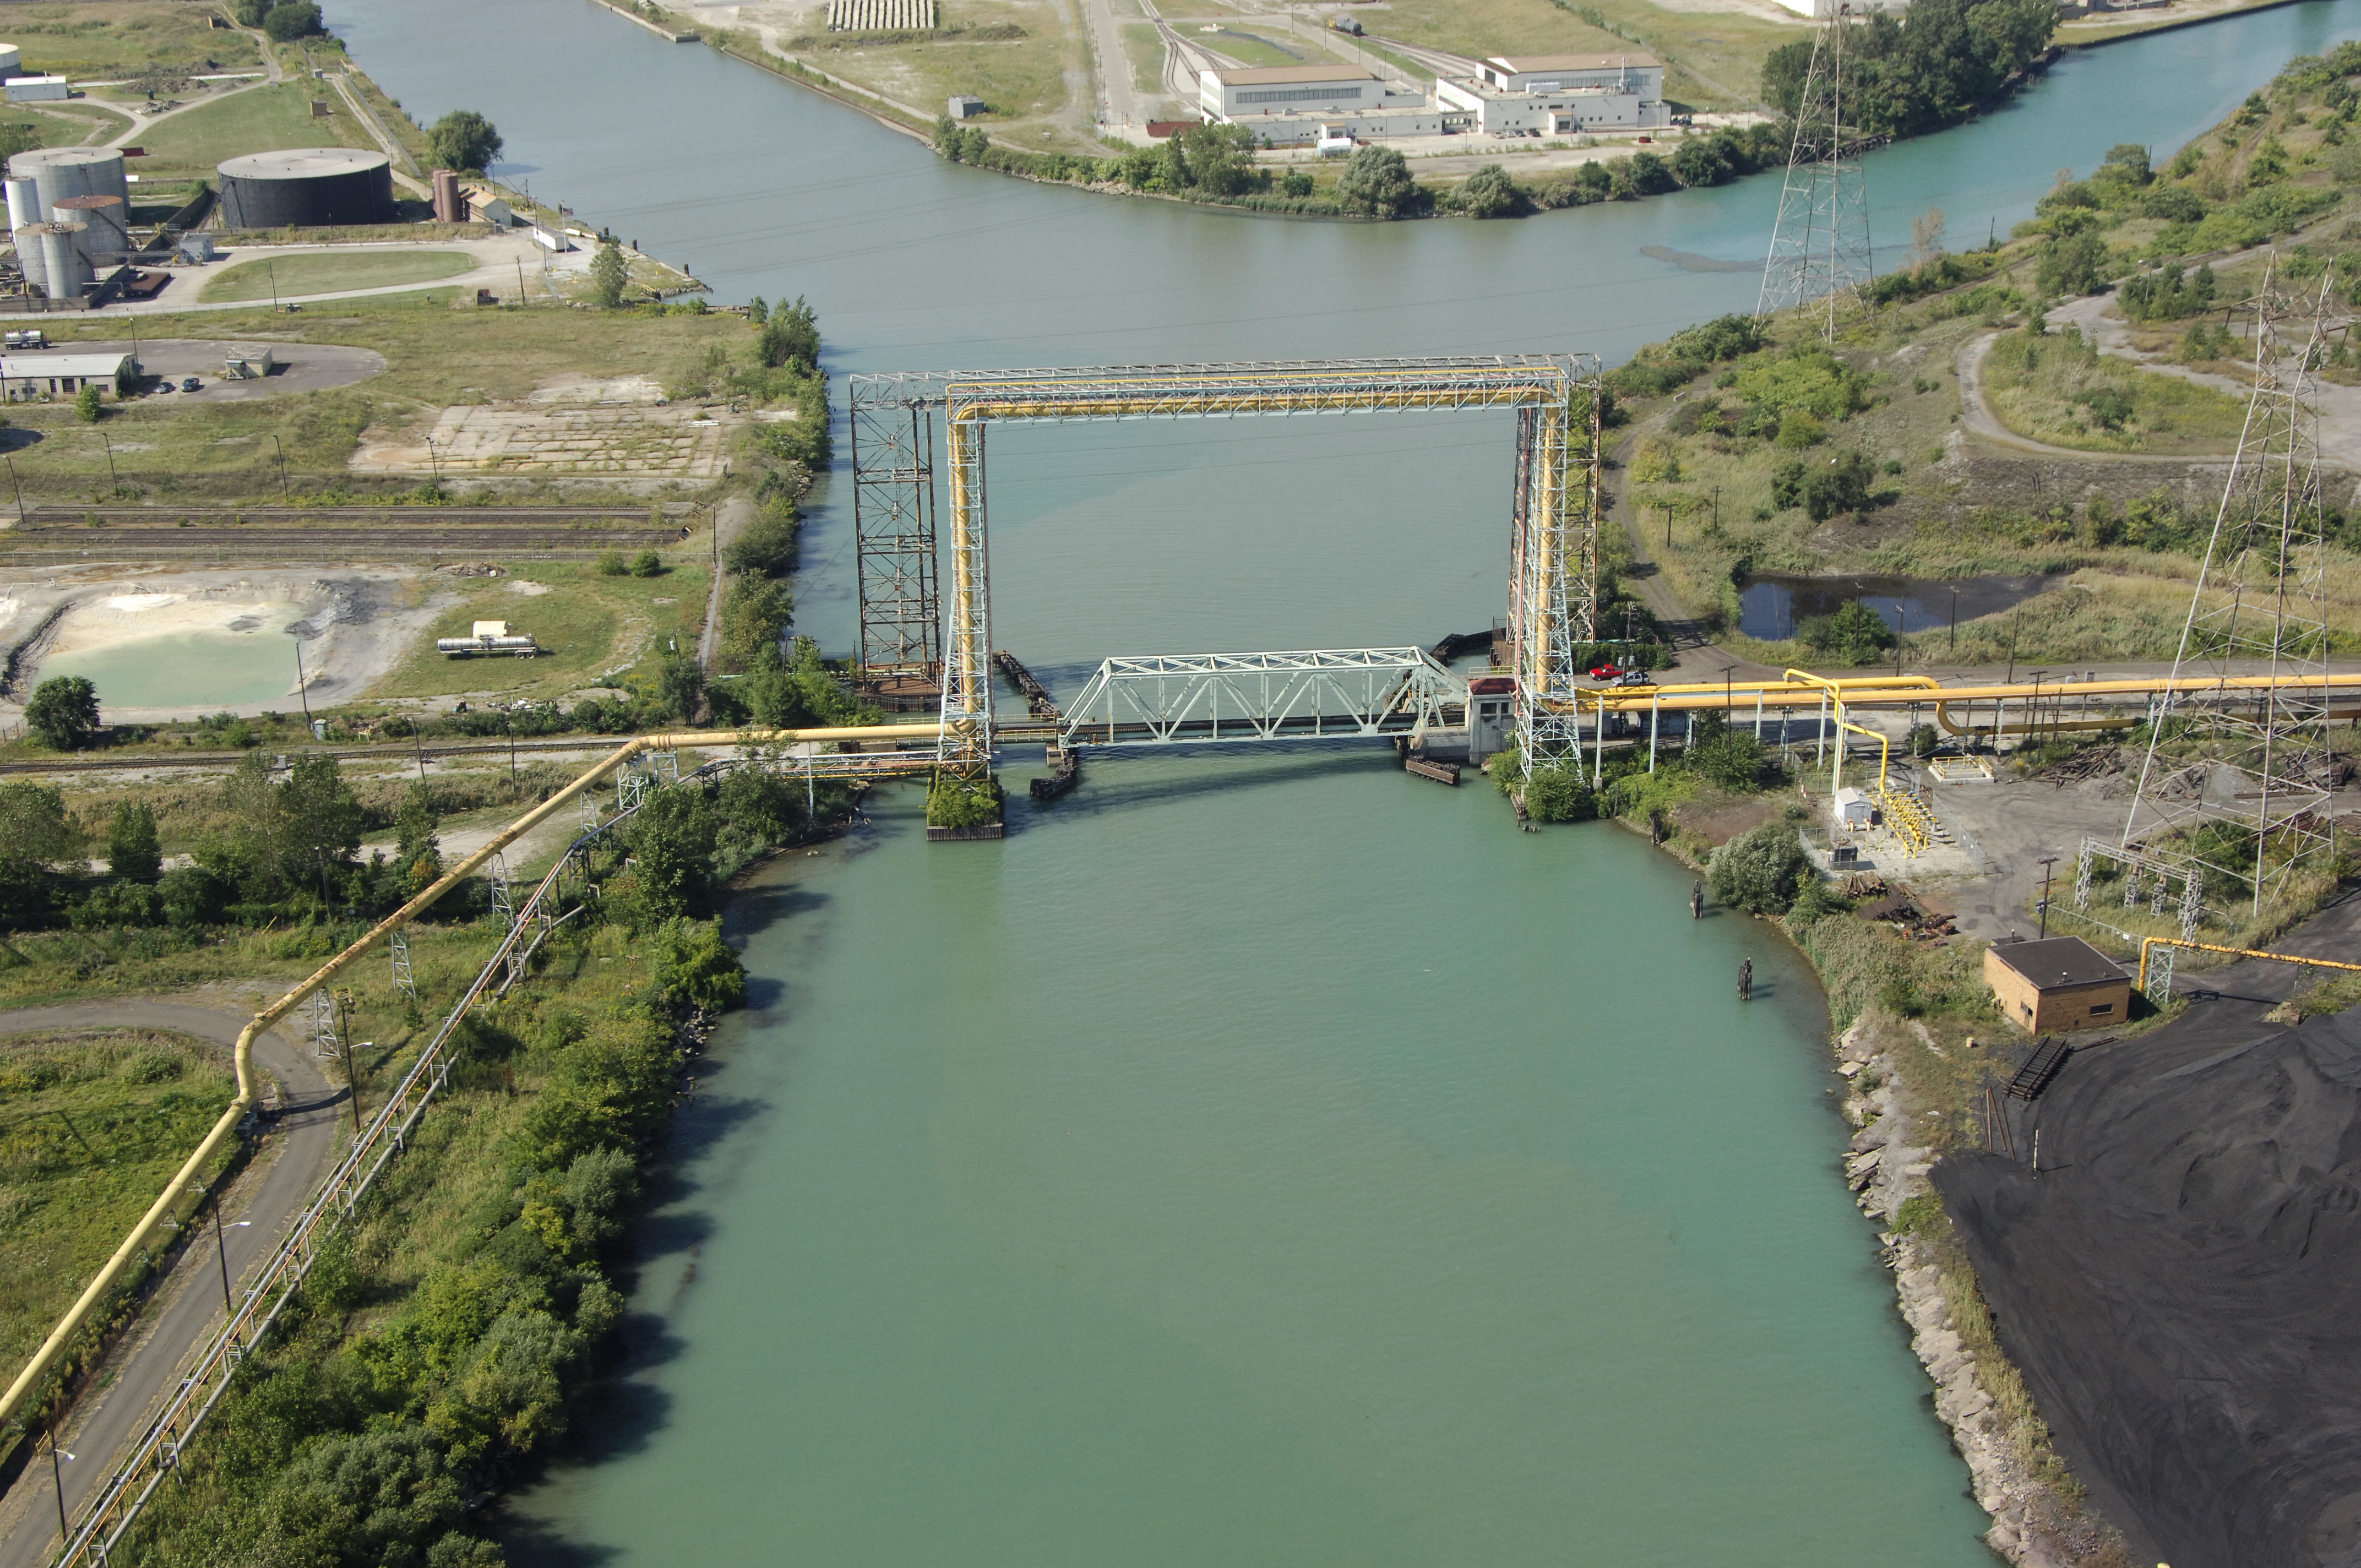 Detroit Toledo & Ironton Bascule Bridge in River Rouge, MI, United States - bridge Reviews ...